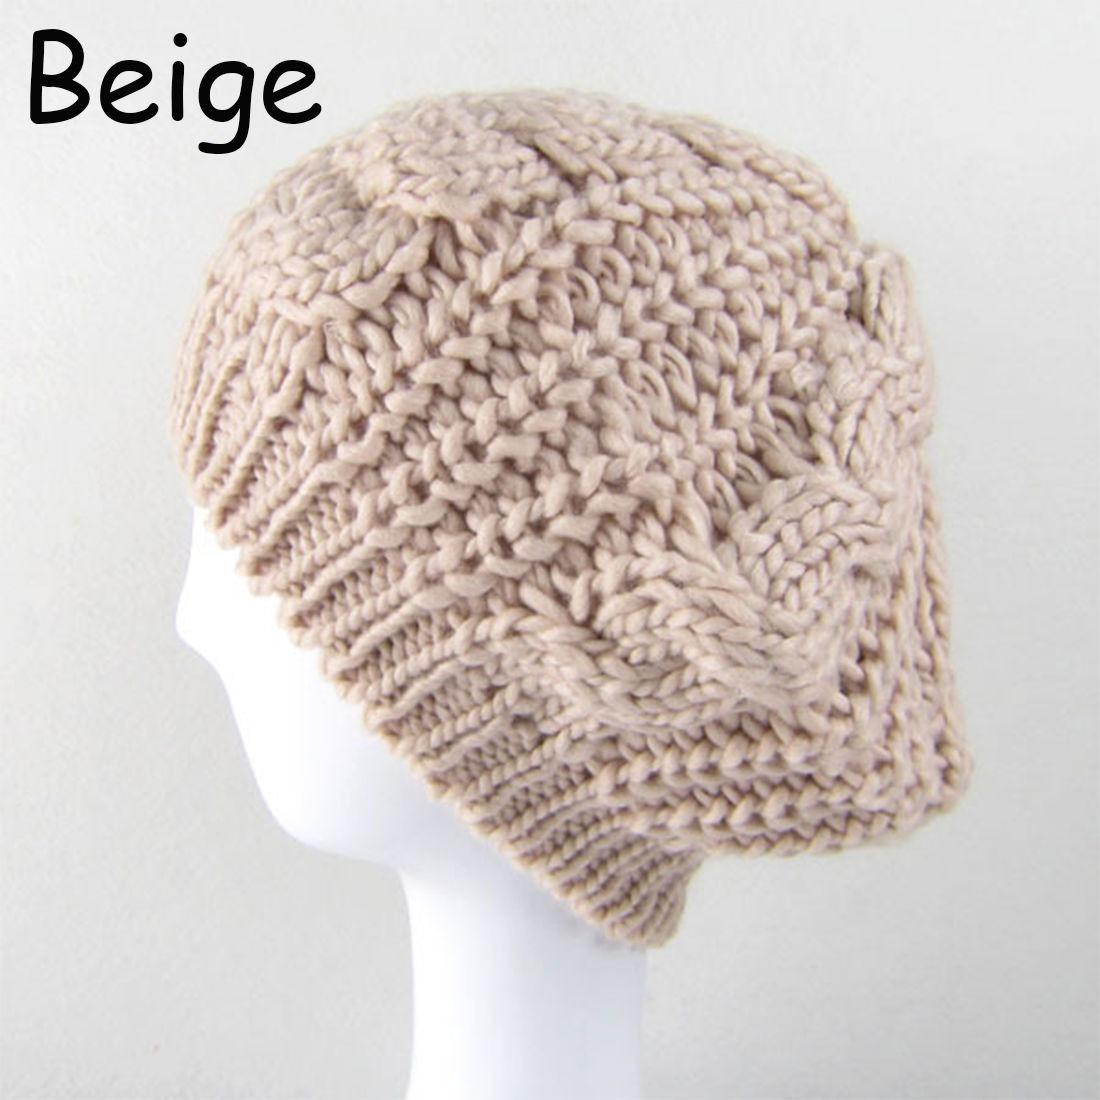 gorro lana frio invierno dama mujer varios color boina voina. Cargando zoom. 0aa53a4b2ff8